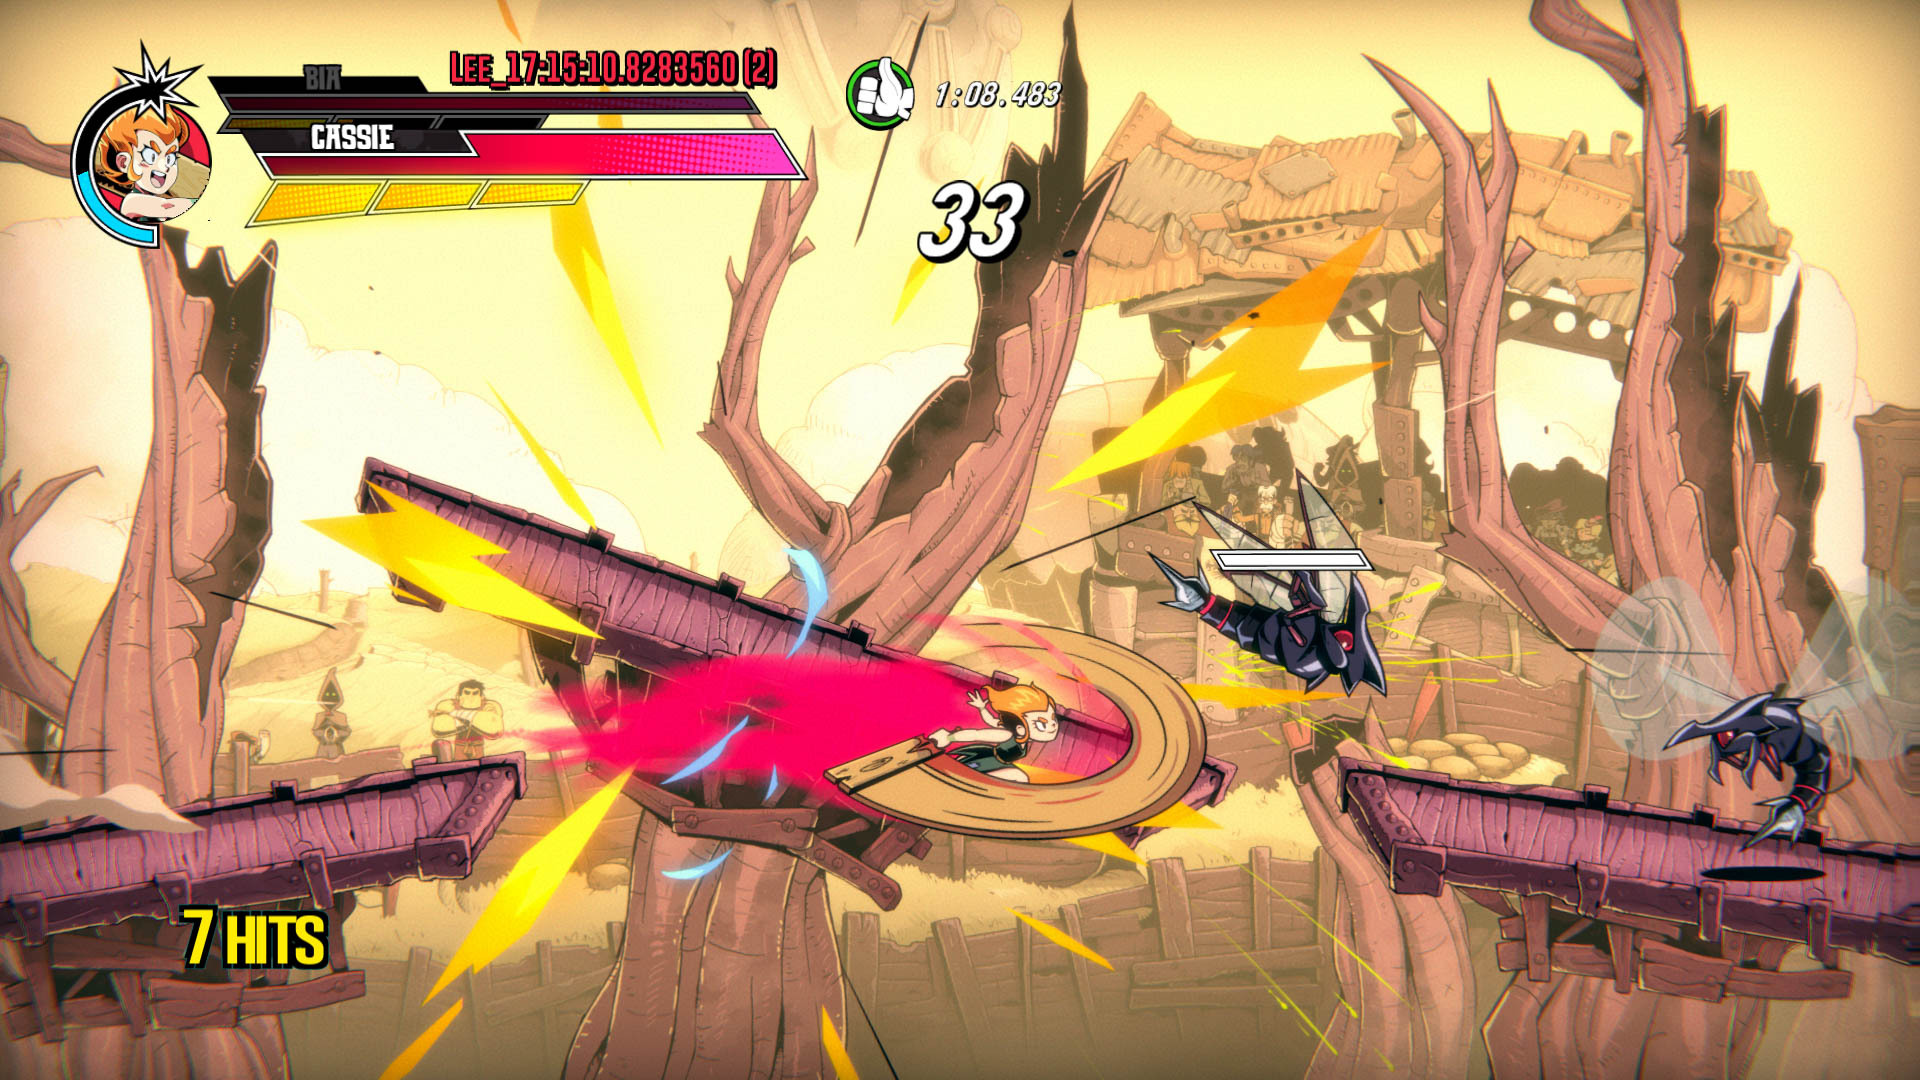 speed-brawl-pc-screenshot-1